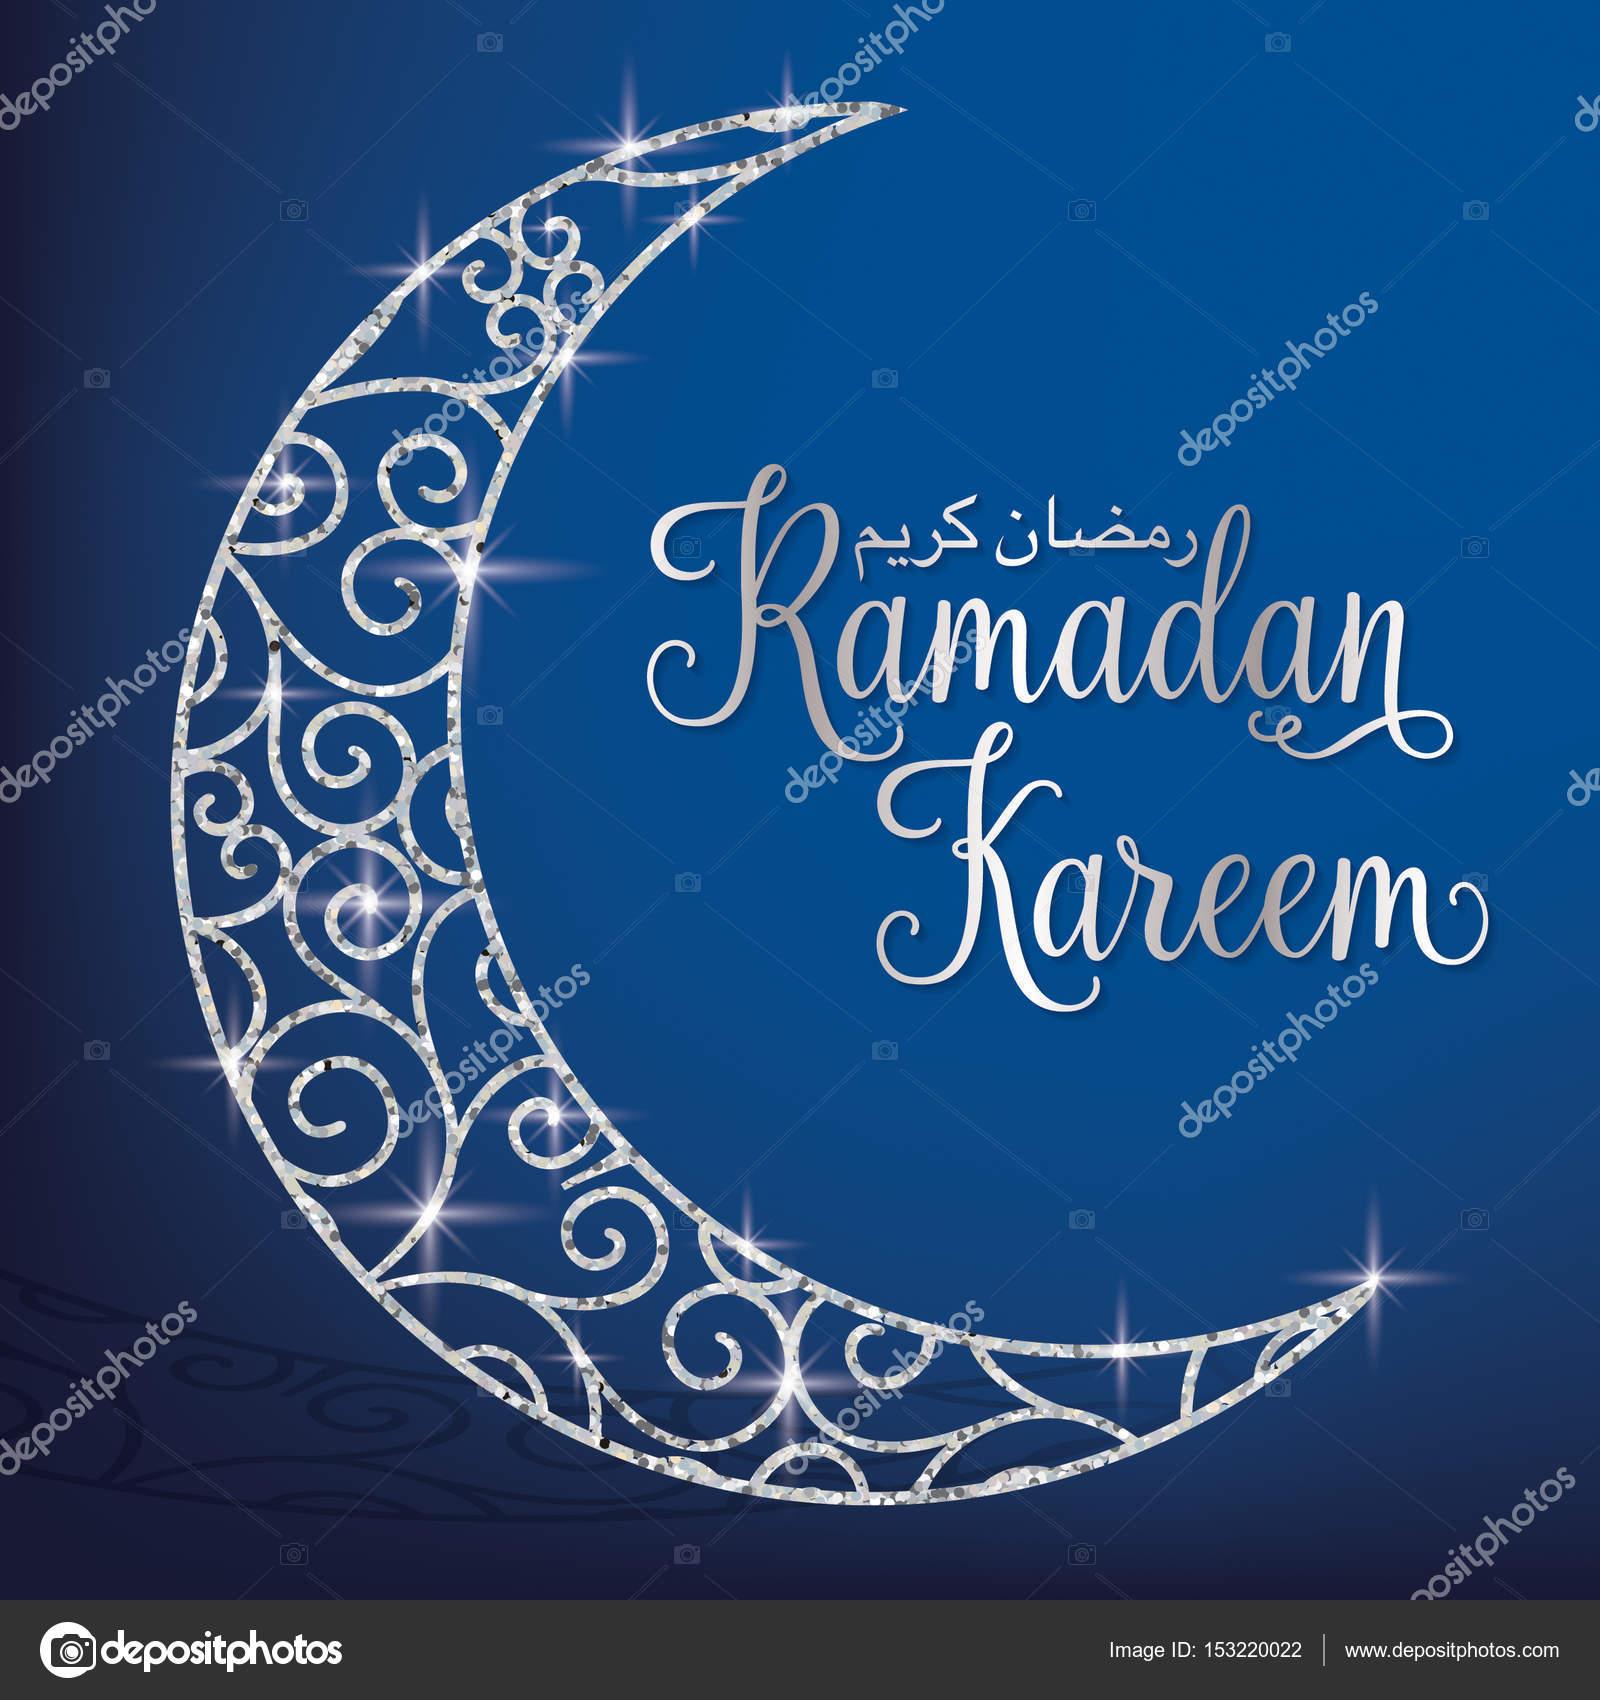 Jemne Trpytky Mesic Ramadan Kareem Stedry Ramadan Karta Stock